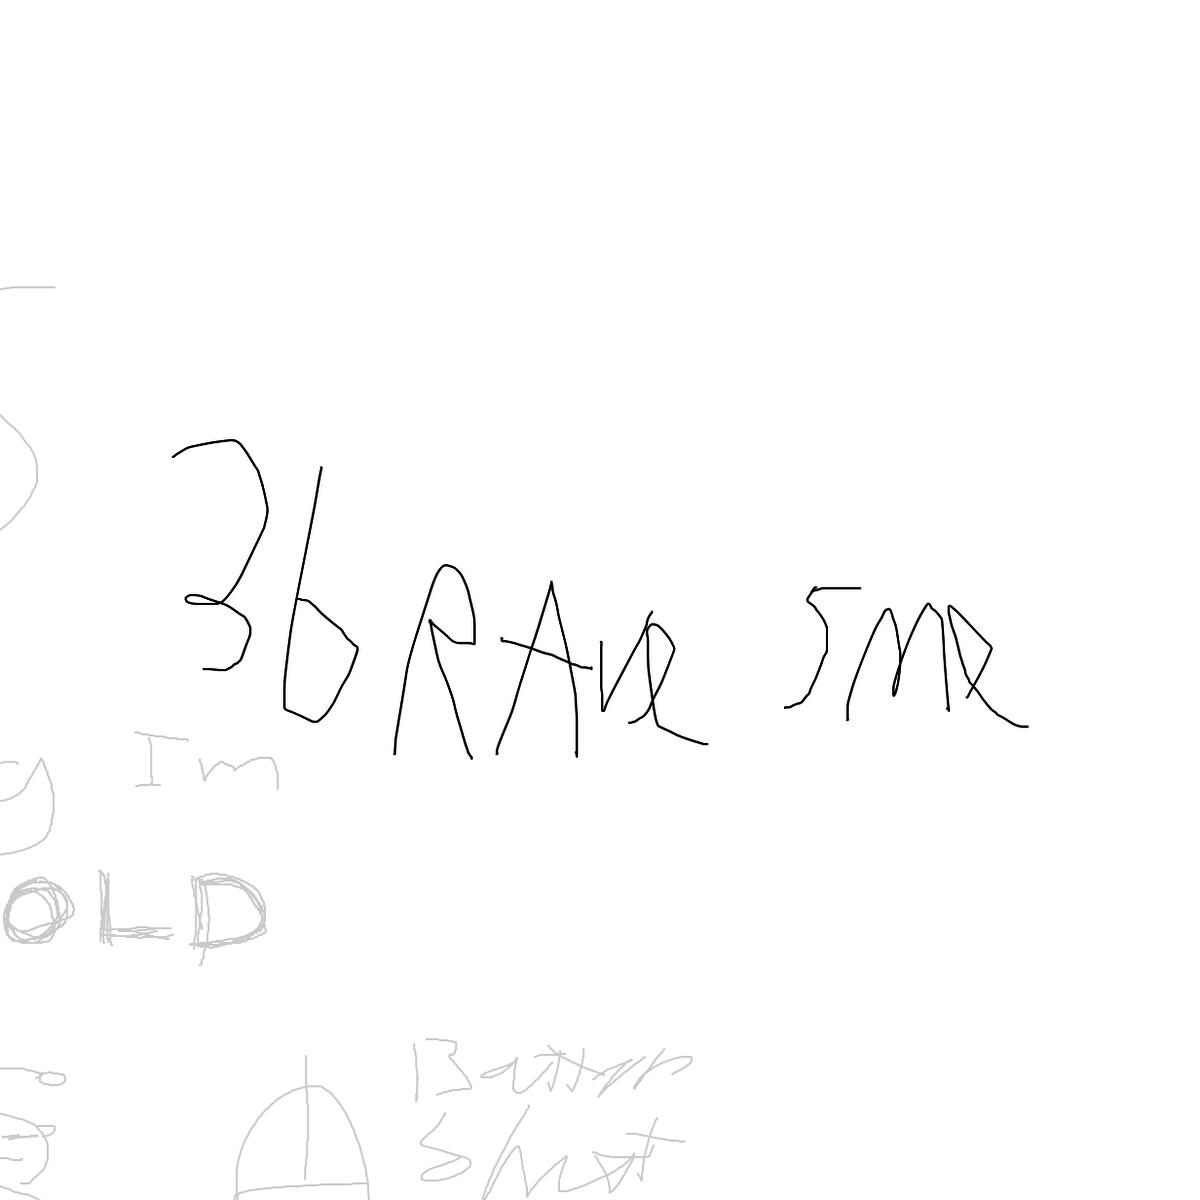 BAAAM drawing#6796 lat:-12.0500297546386720lng: -51.5038414001464840